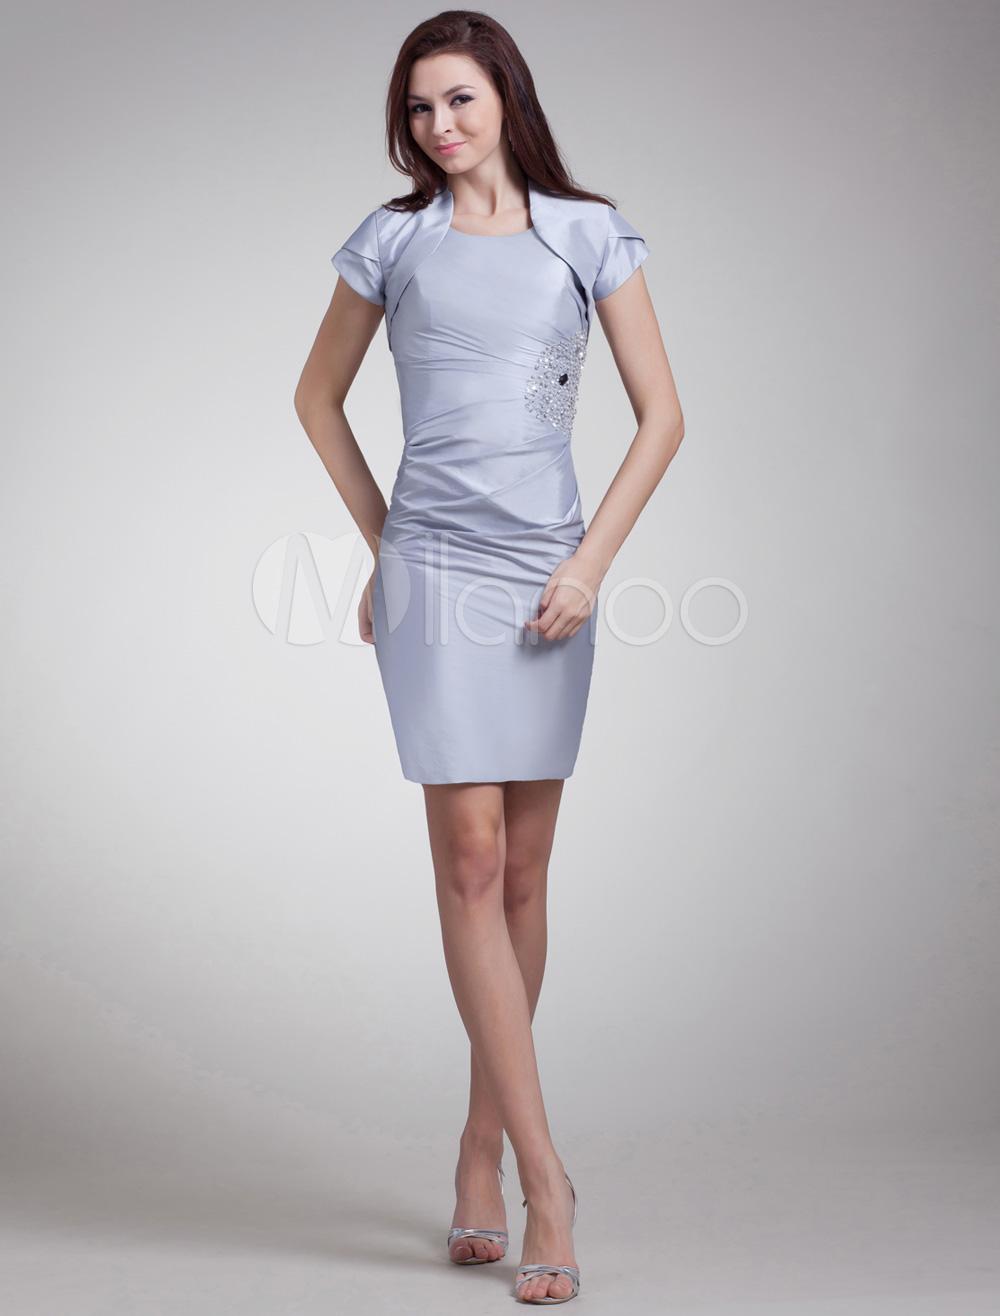 Silver Beading Scoop Neck Taffeta Short Cocktail Dress For Women ...